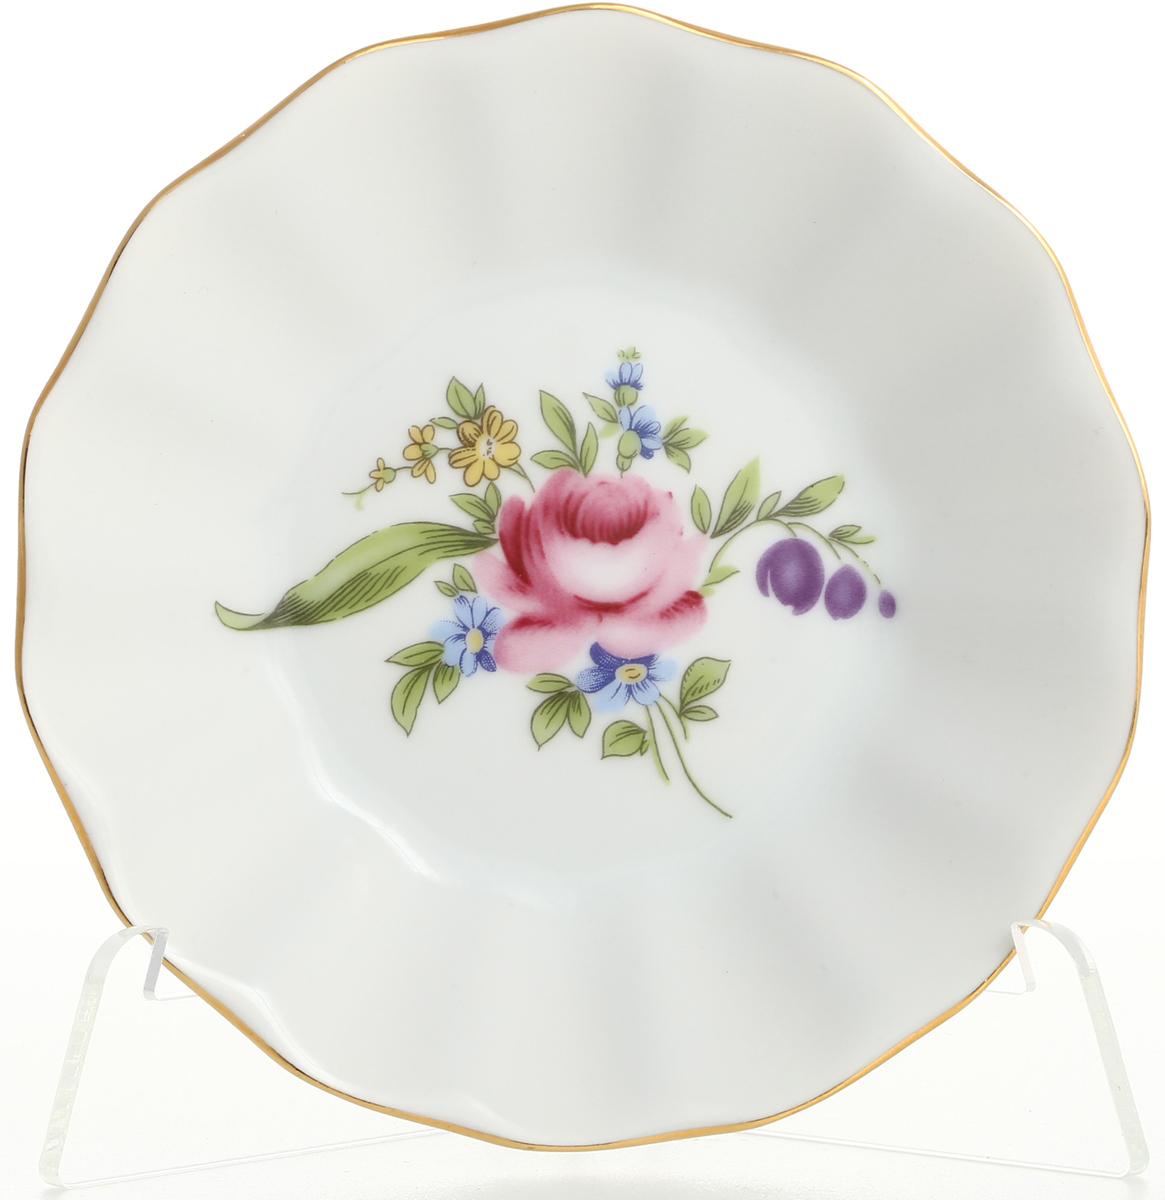 Набор розеток Bernadotte Полевой цветок, диаметр 11 см, 6 шт memory tip 6 511 40 11